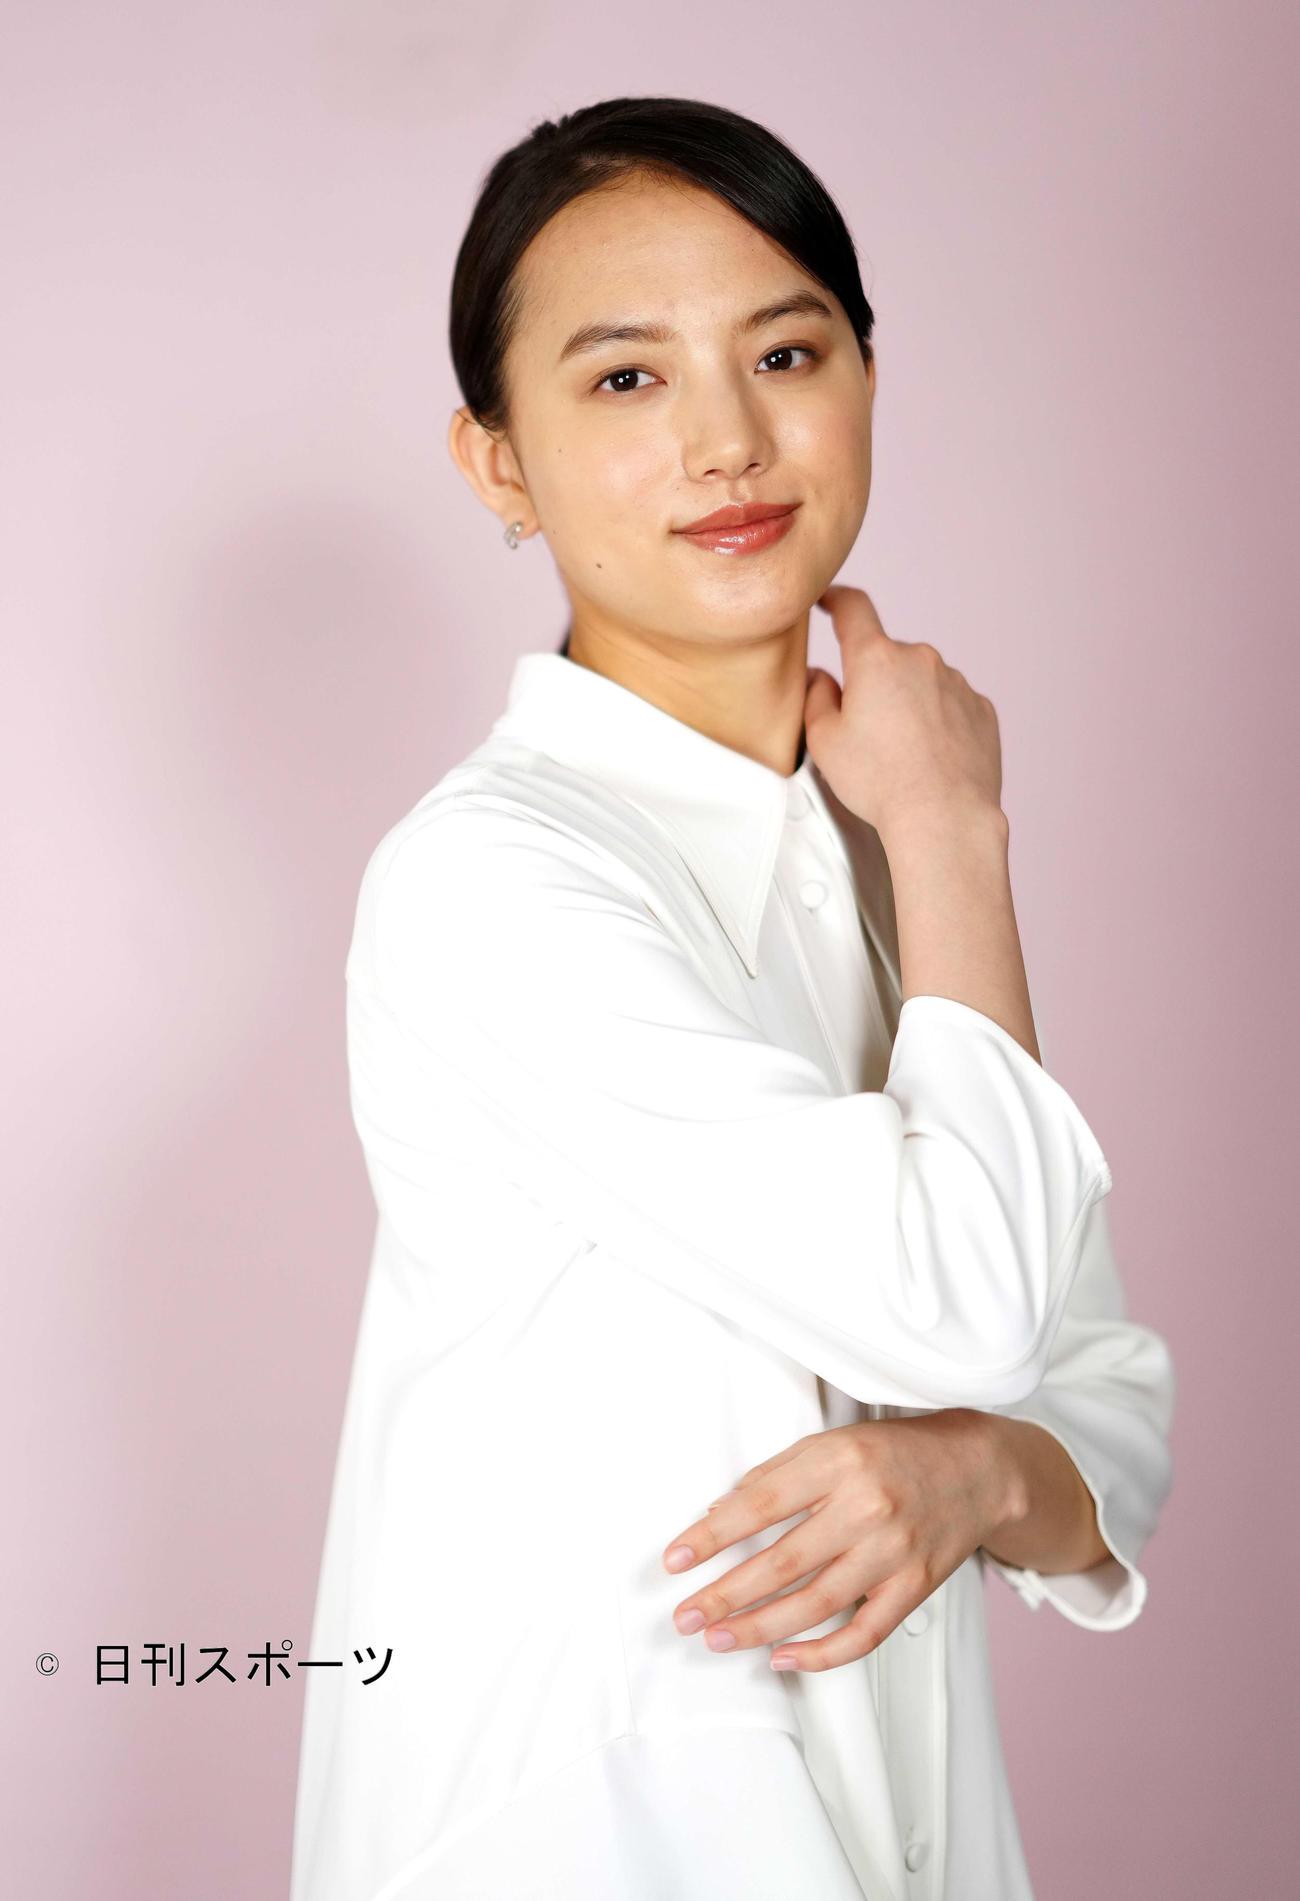 NHK連続テレビ小説「おかえりモネ」でヒロインを務める清原果耶(撮影・江口和貴)